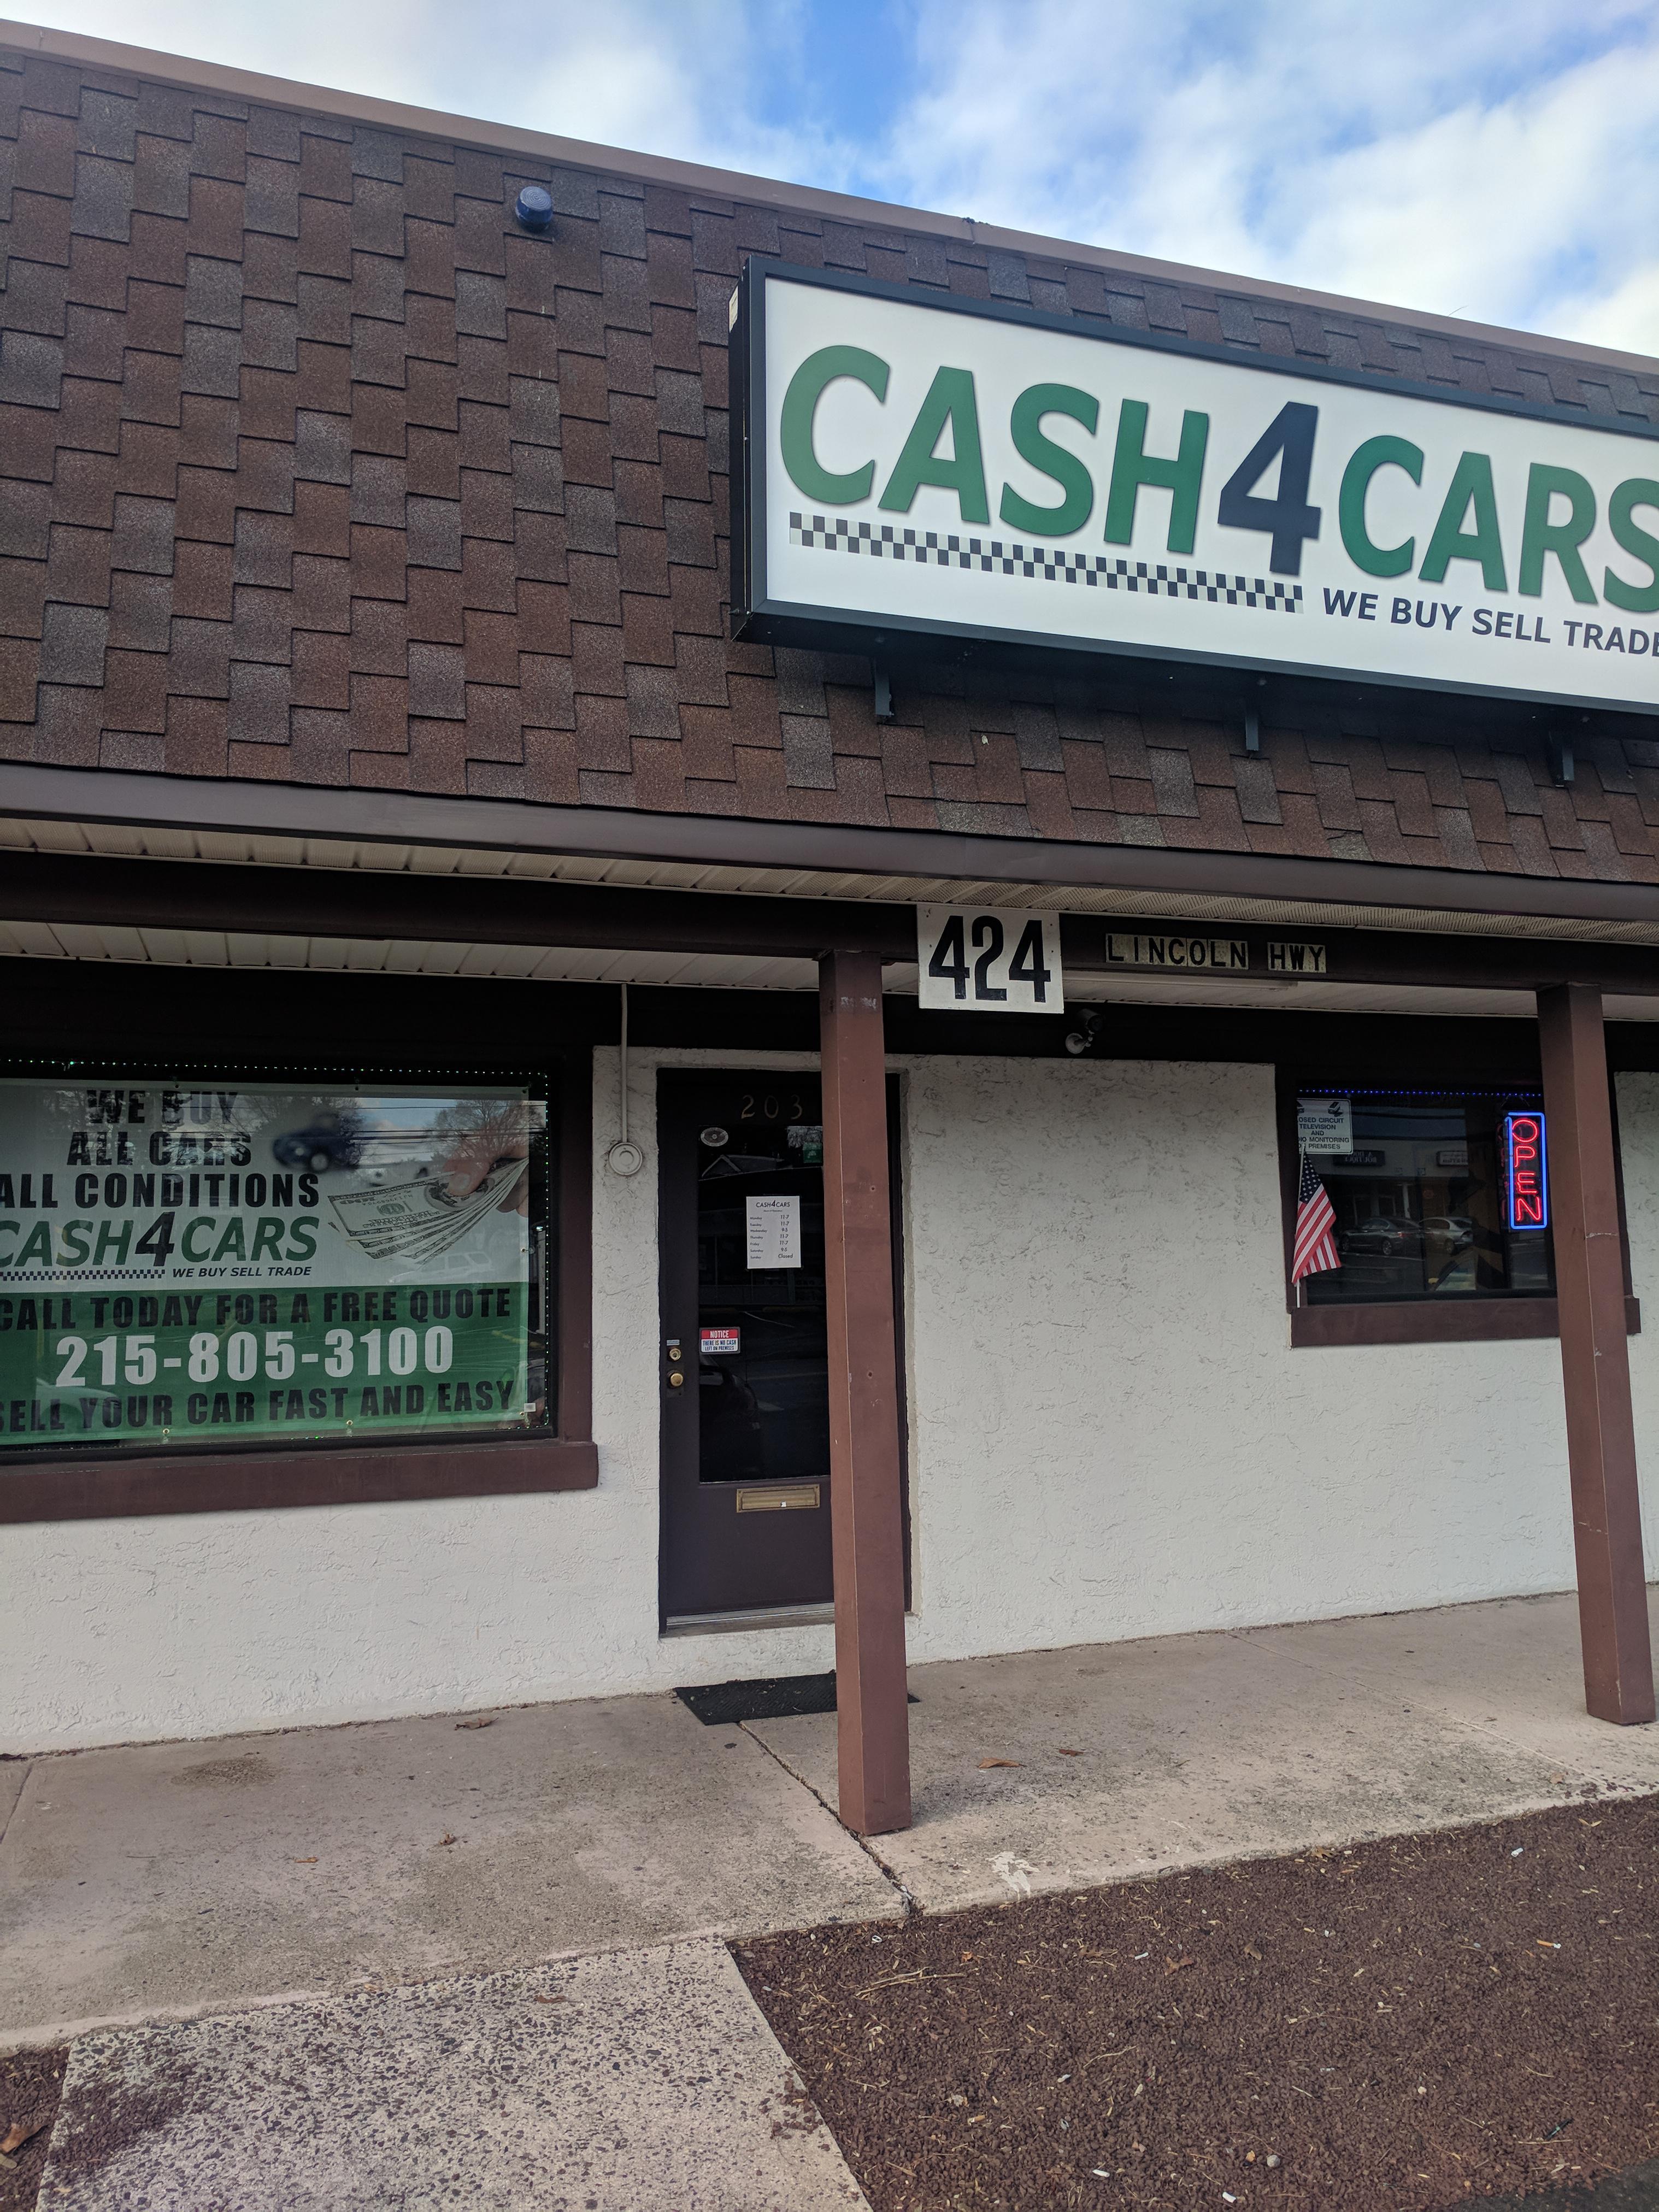 Cash 4 Cars image 6